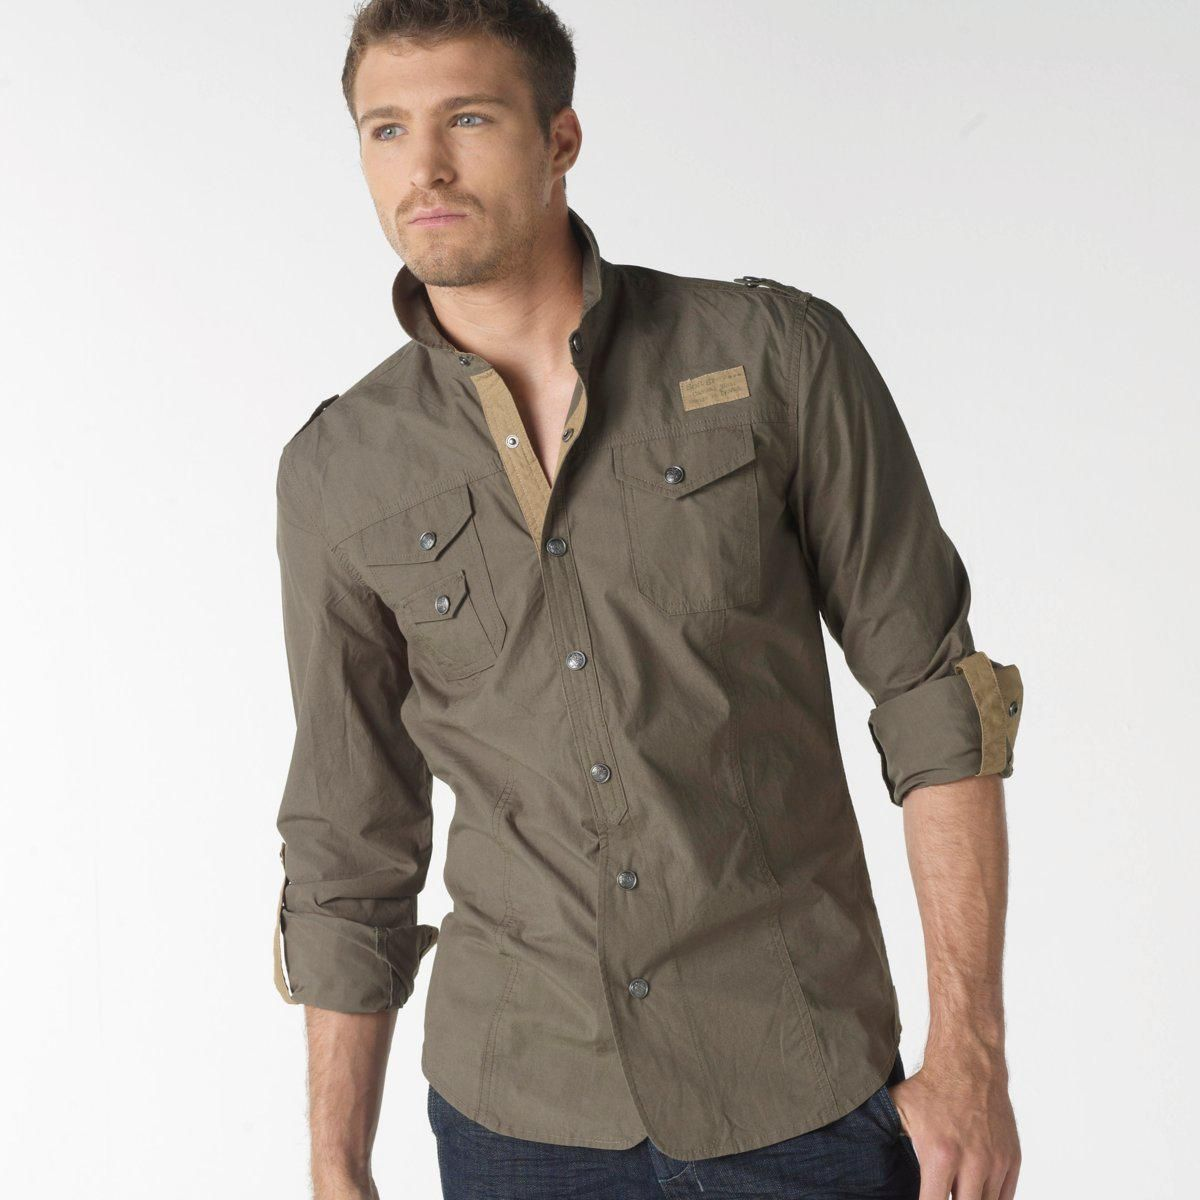 c926ee54d6 Camisa militar manga larga 100% algodón